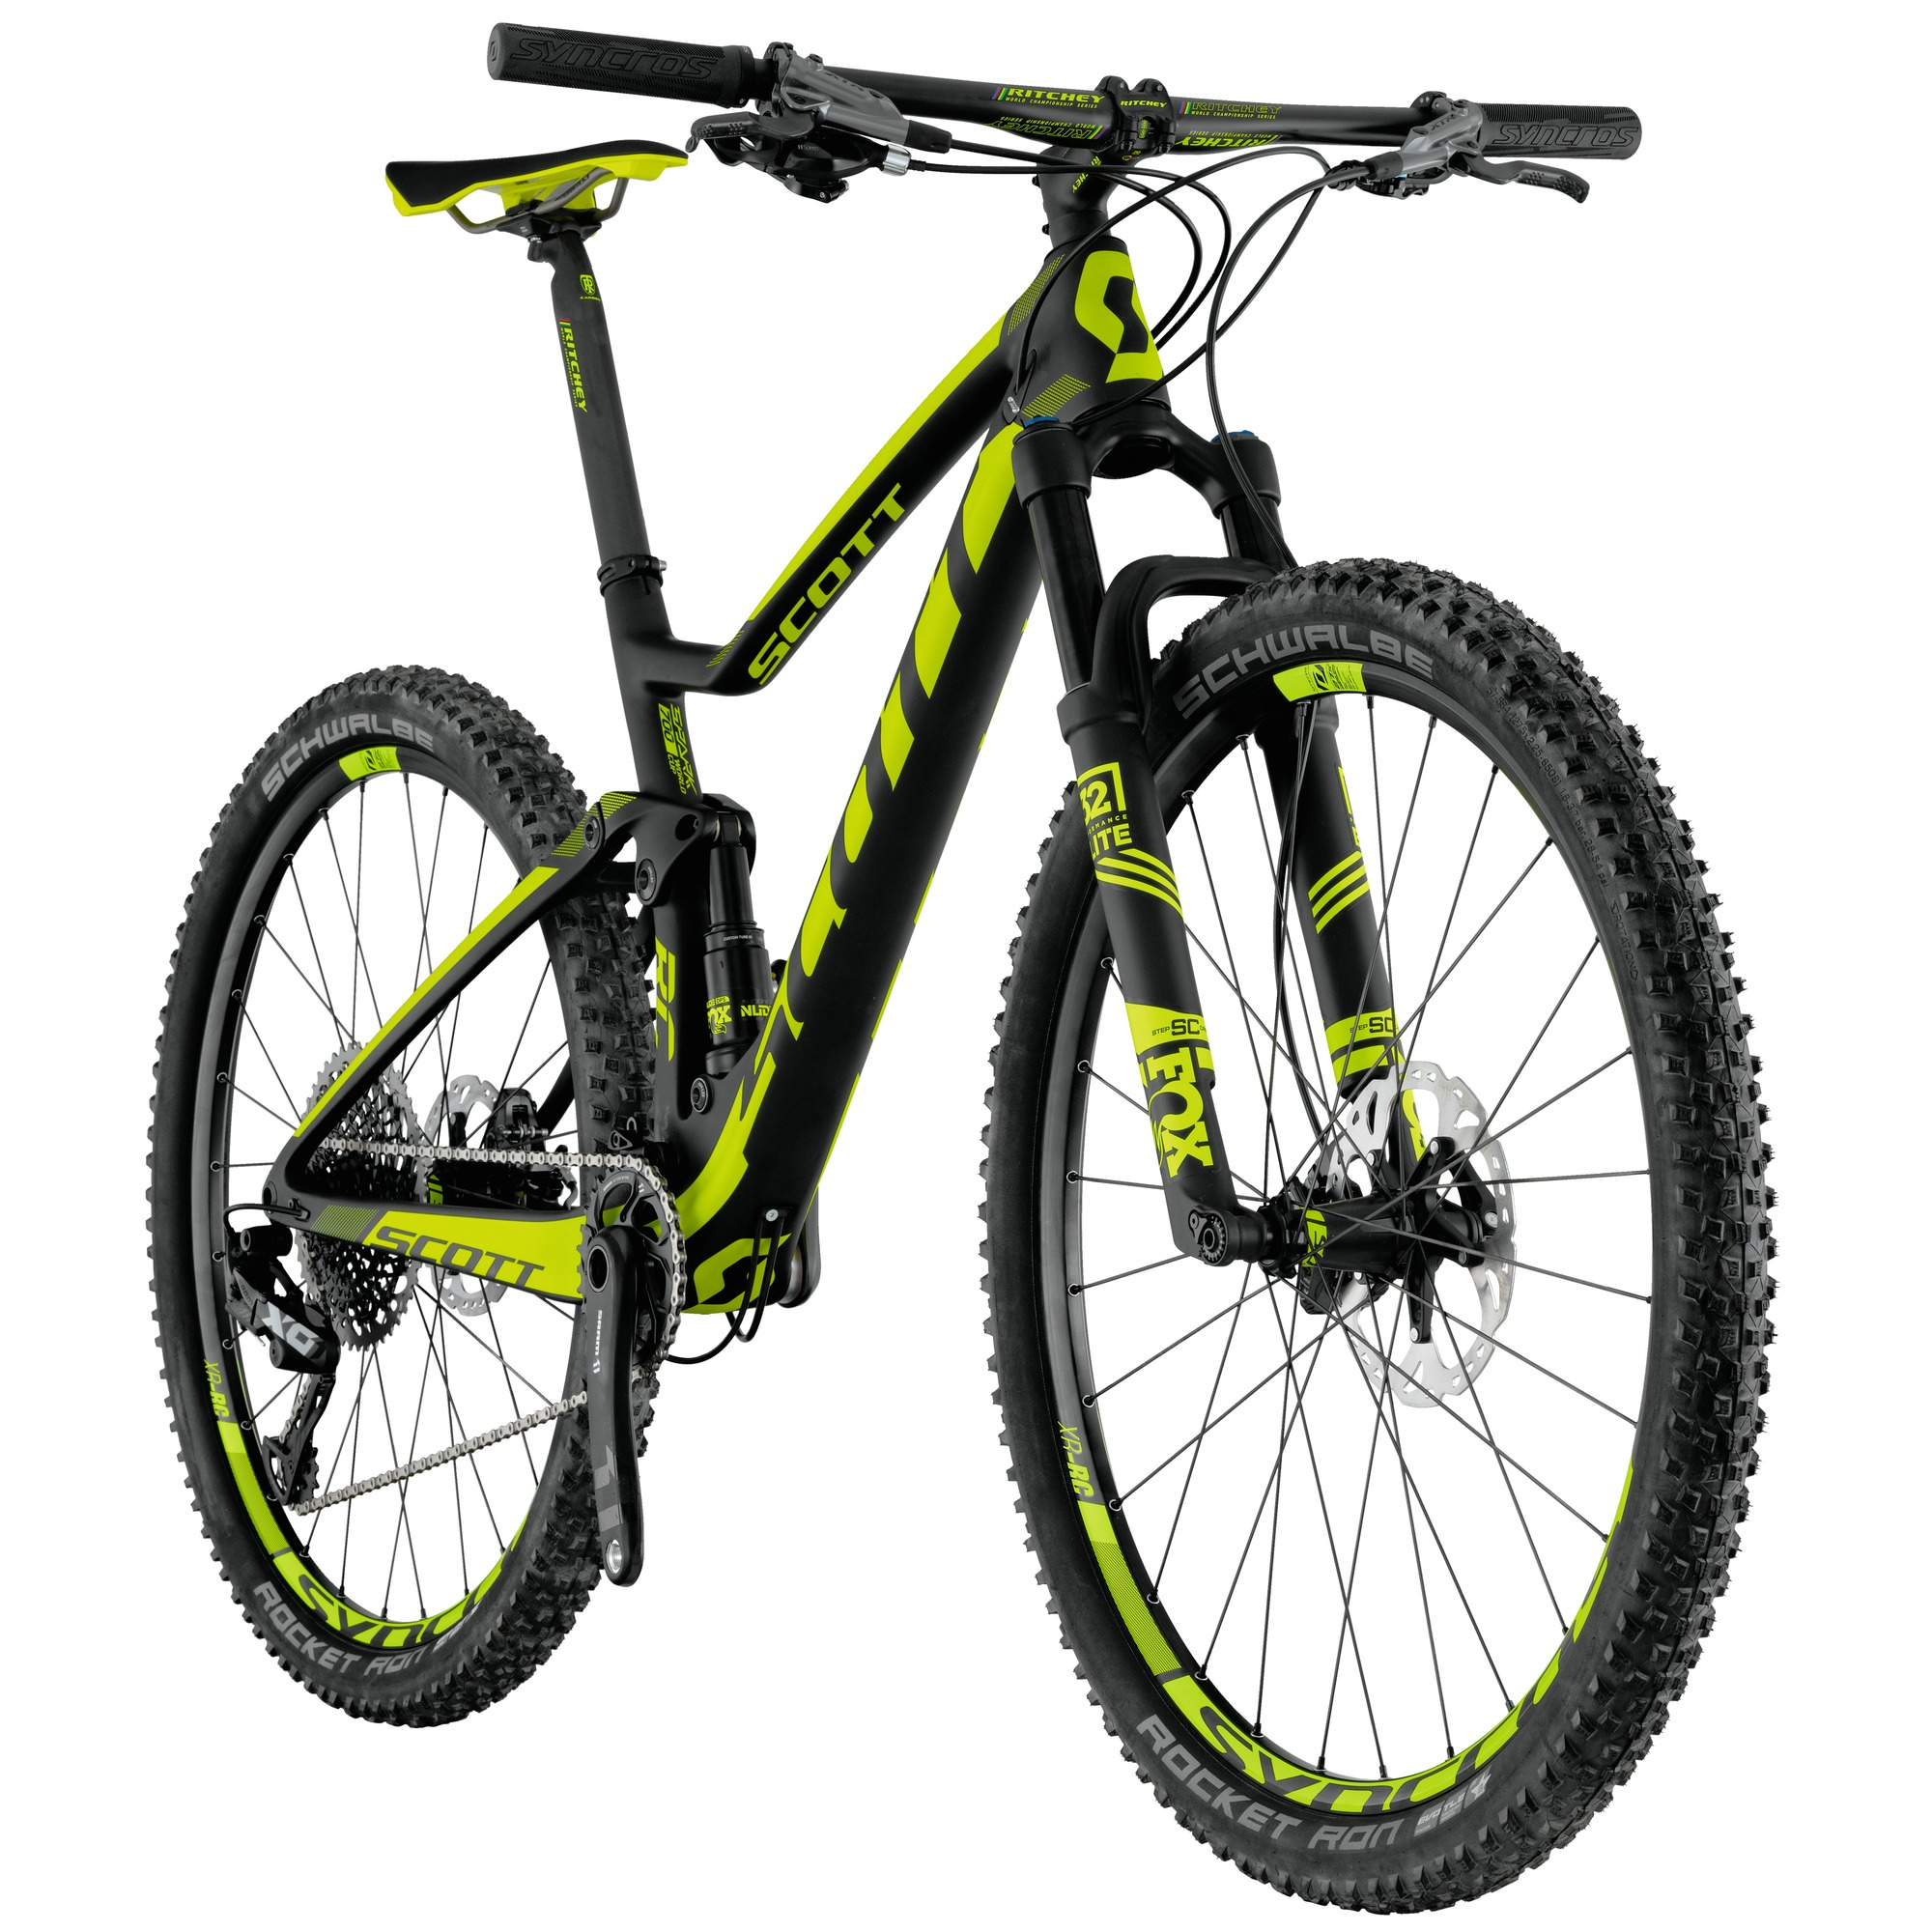 Scott Spark 700 RC Carbon Mountain Bike